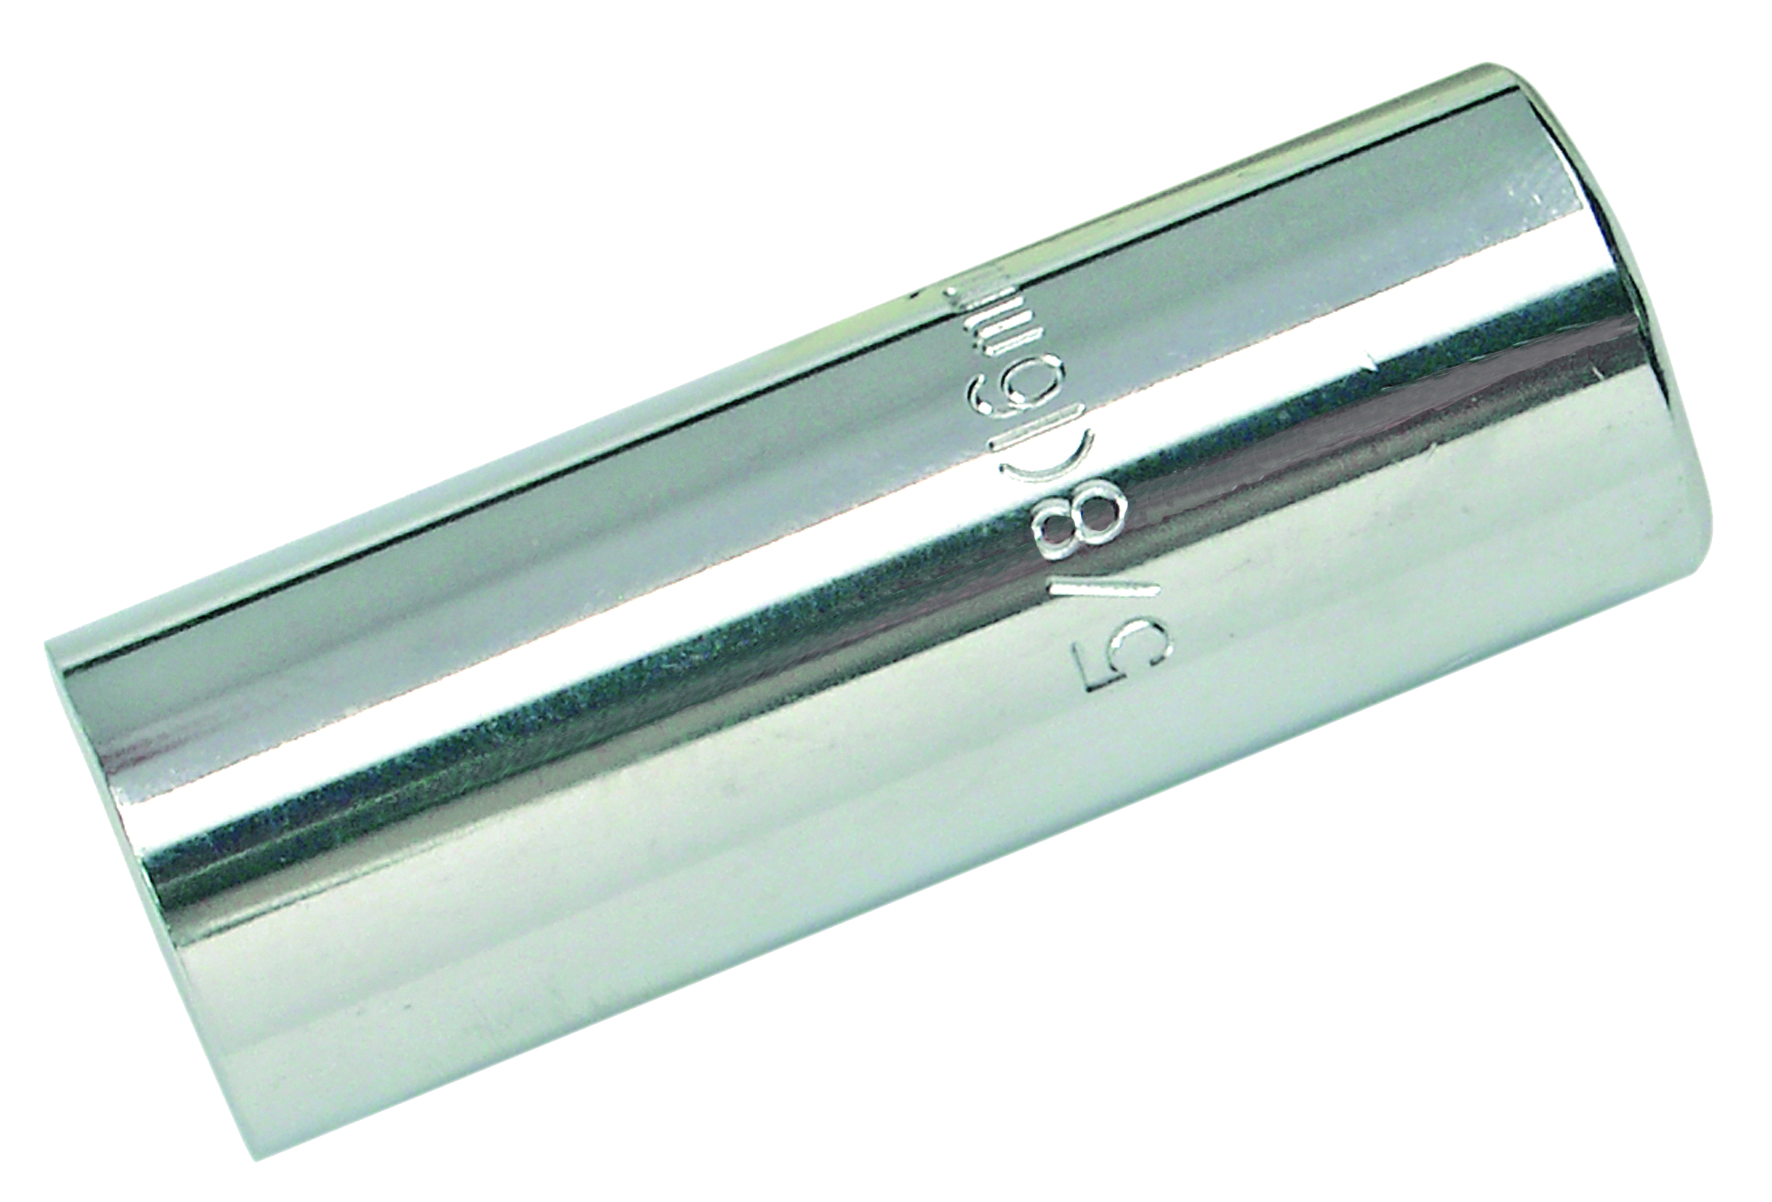 SWSTAHL Spark plug socket, 1/2 inch, 16 mm 03101SB